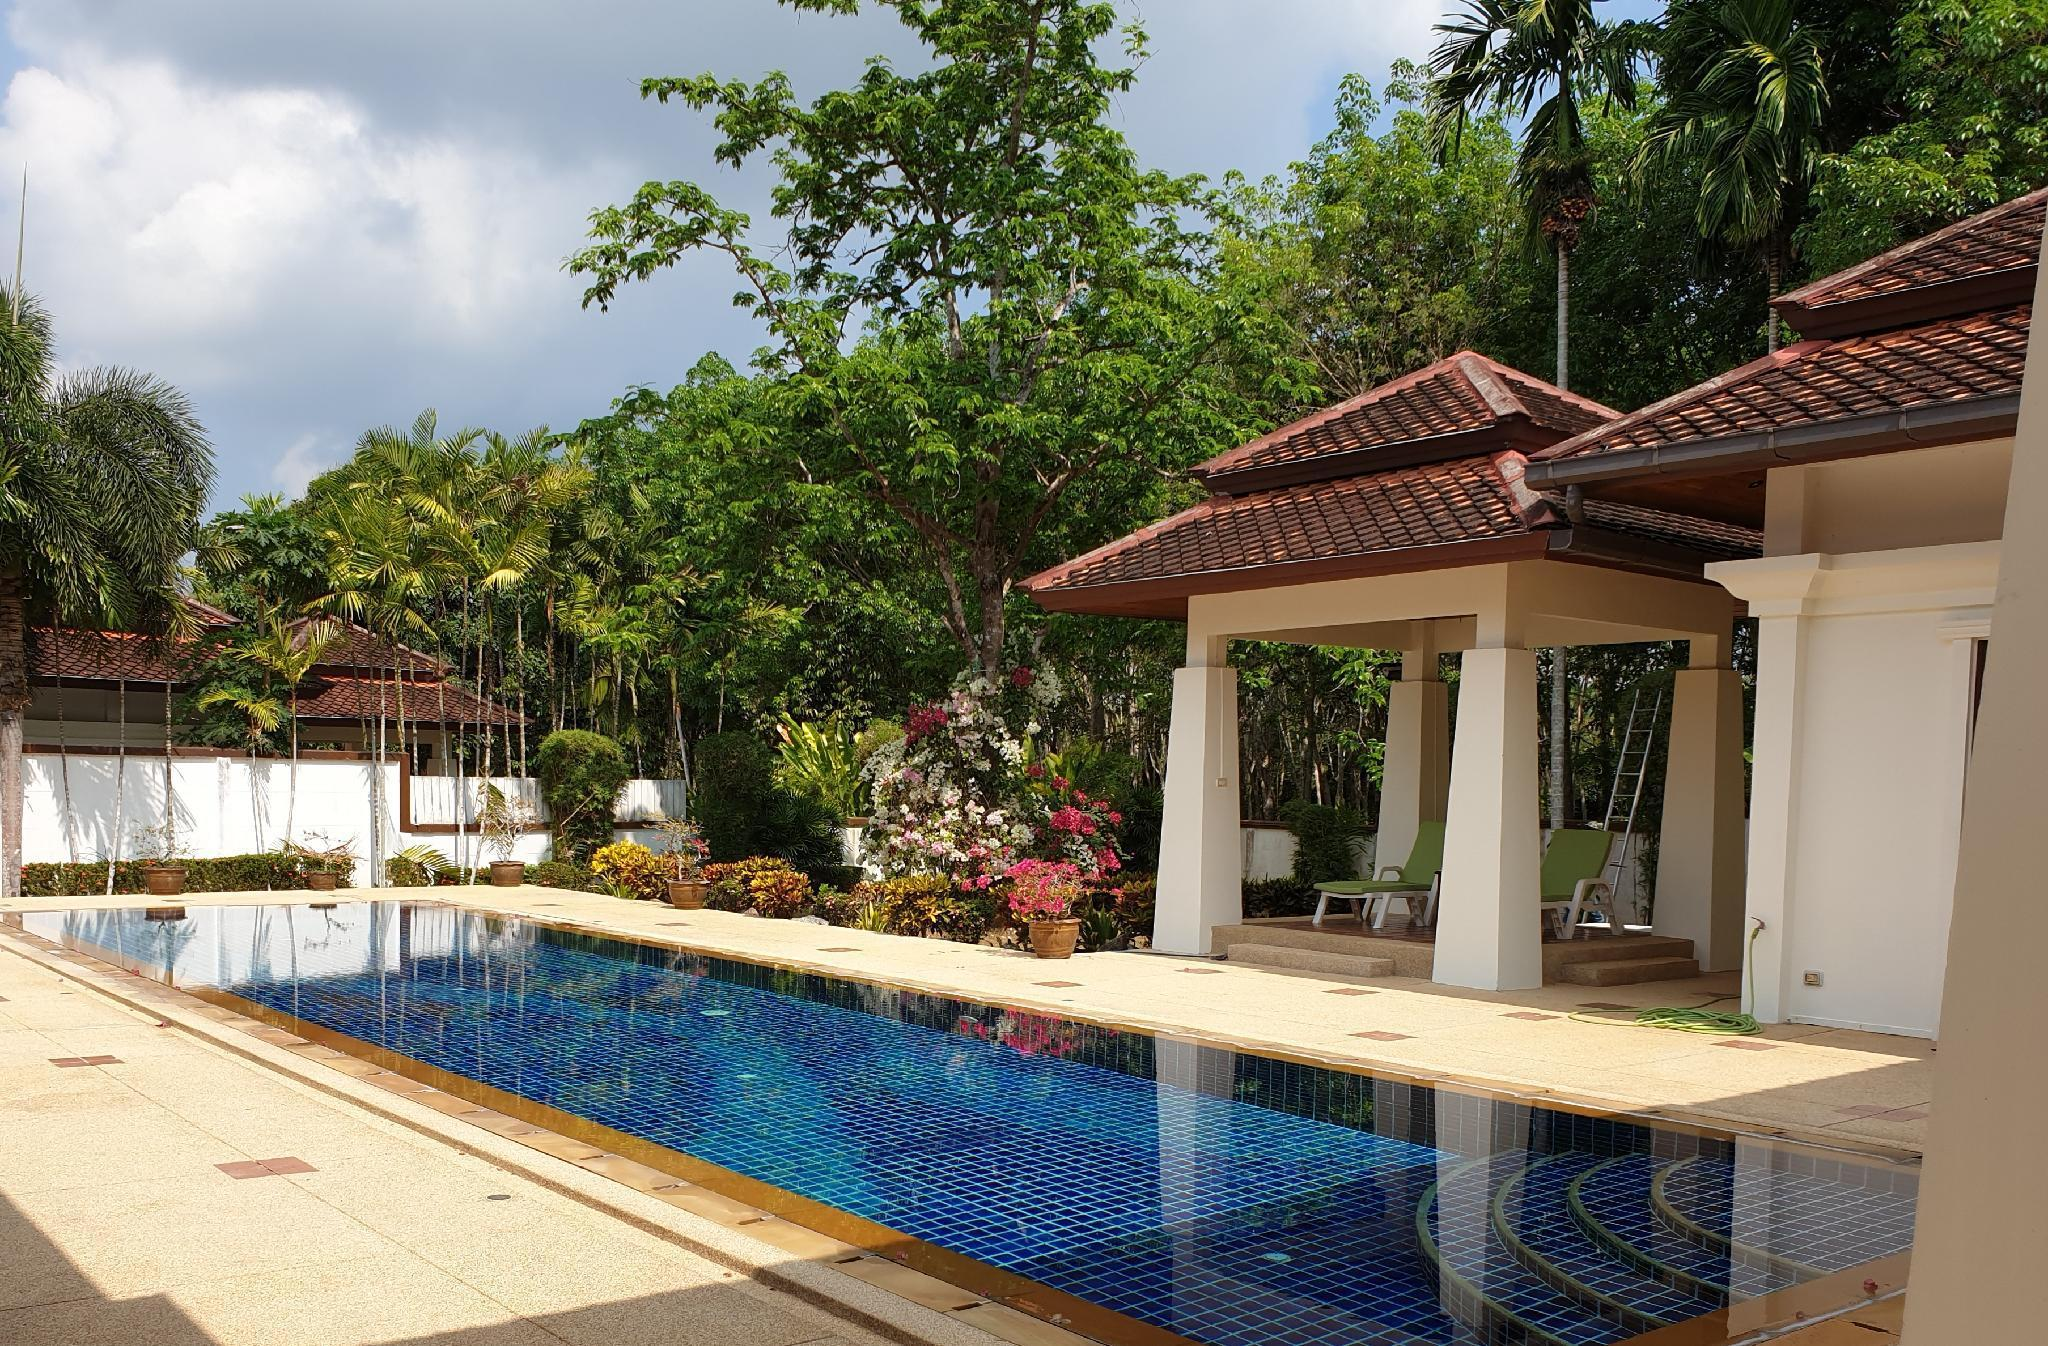 Garden Villas - A luxury oasis วิลลา 4 ห้องนอน 4 ห้องน้ำส่วนตัว ขนาด 600 ตร.ม. – อำเภอถลาง